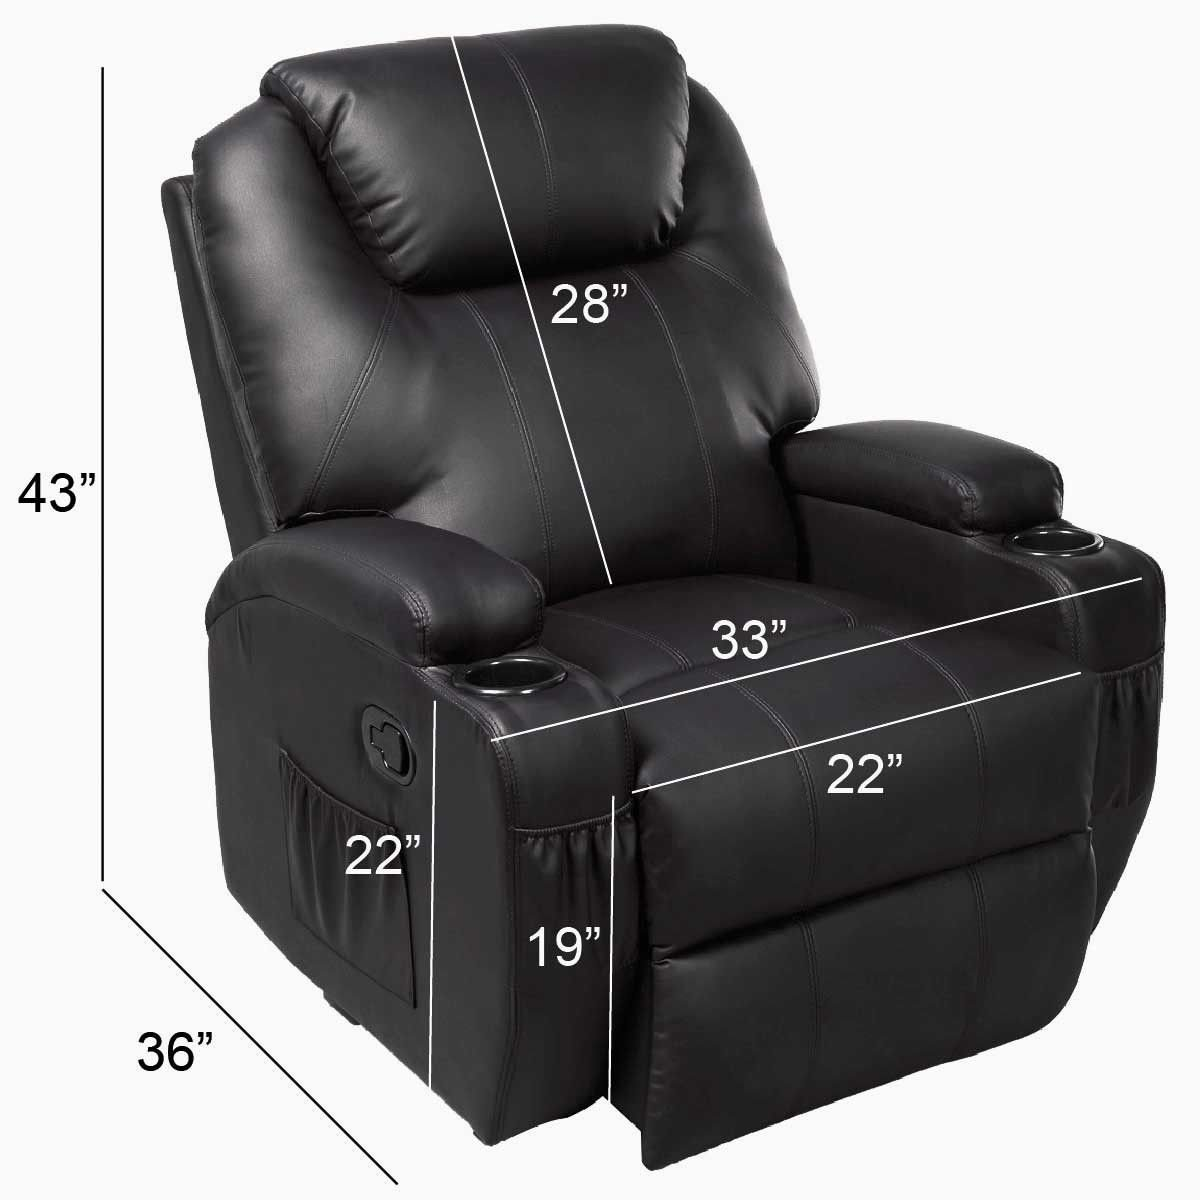 Amazon.com GHP Black Sturdy Ergonomic Seating Massage Recliner Sofa Chair Lounge Heated w Control Kitchen u0026 Dining  sc 1 st  Amazon.com & Amazon.com: GHP Black Sturdy Ergonomic Seating Massage Recliner ... islam-shia.org